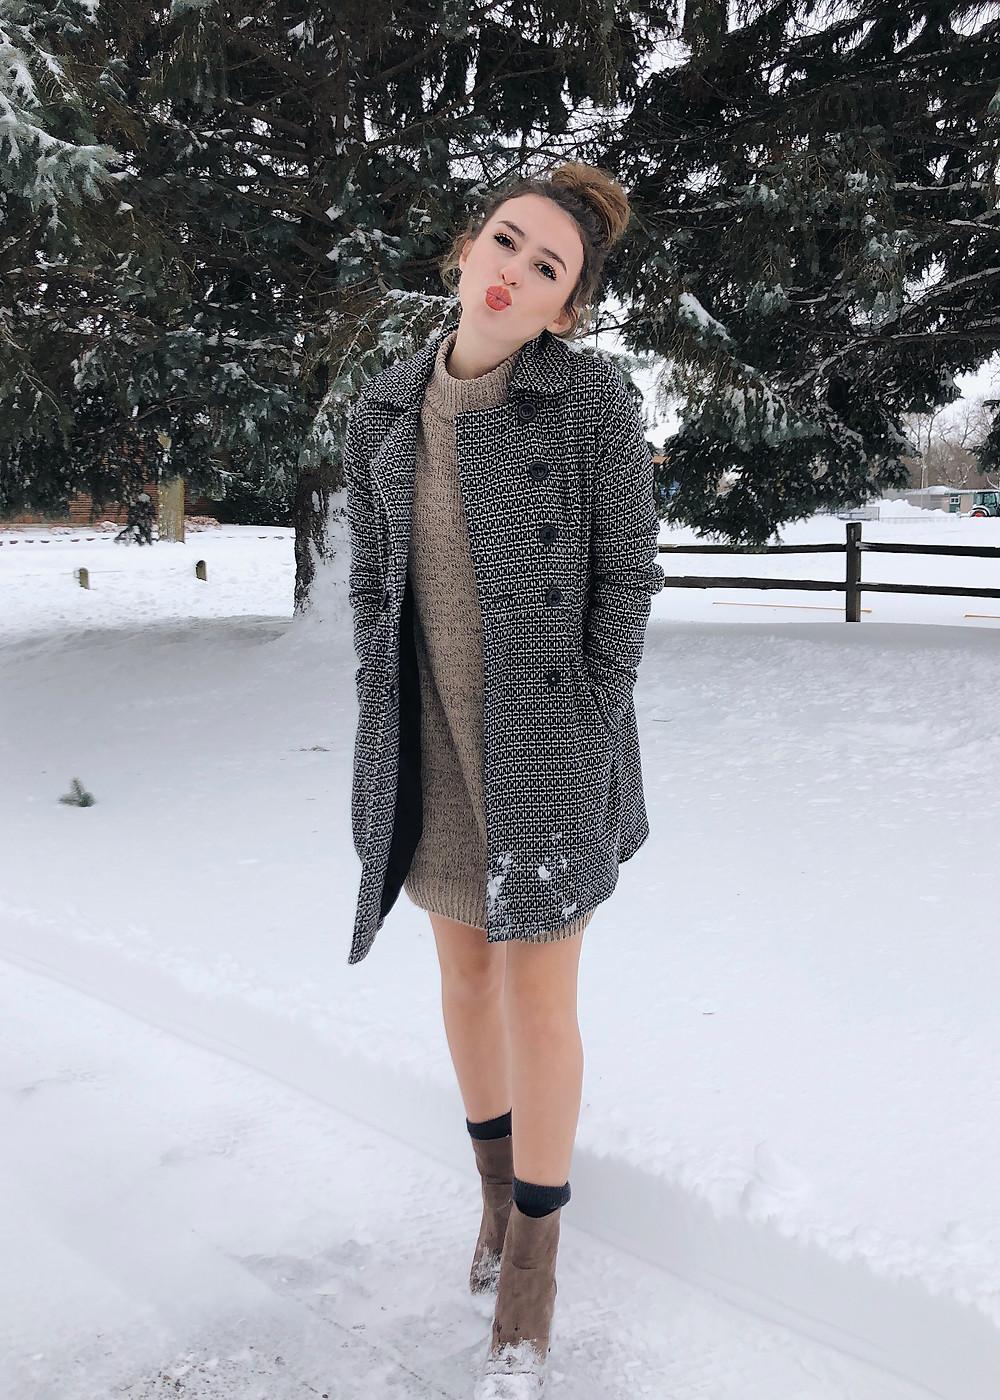 SheIn sweater dress, abby graf, the bleached curl, fashion blog